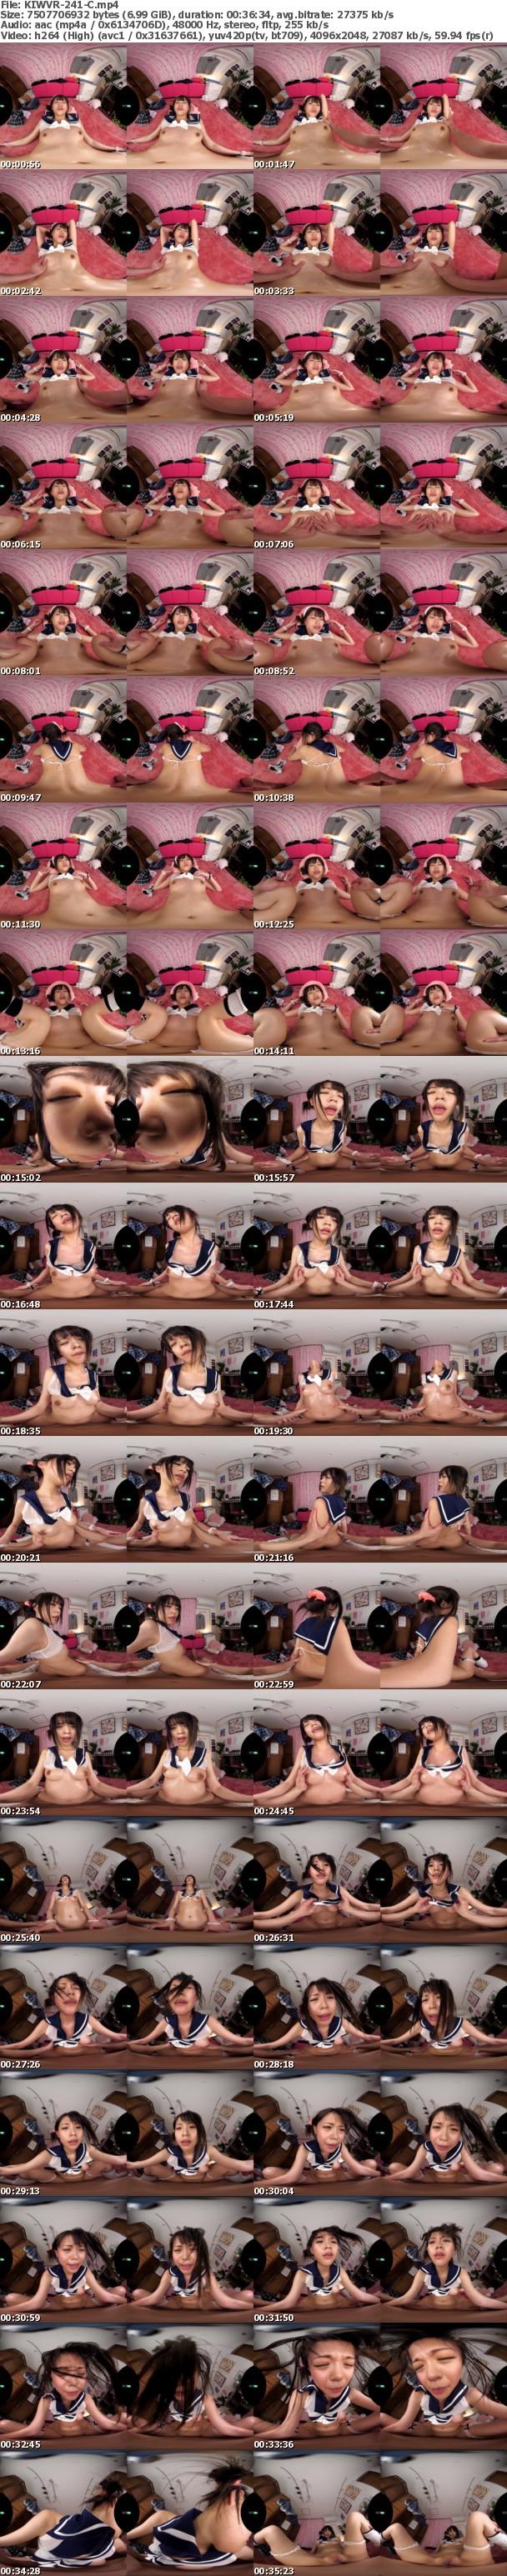 (VR) KIWVR-241 【お触り禁止!本番禁止!】某有名店の美巨乳新人を【キメパコ】FUCK!疑うことを知らない無垢な女子○生を媚薬で発情させて【生中出し】しちゃったJ○リフレ! 乃木ののか